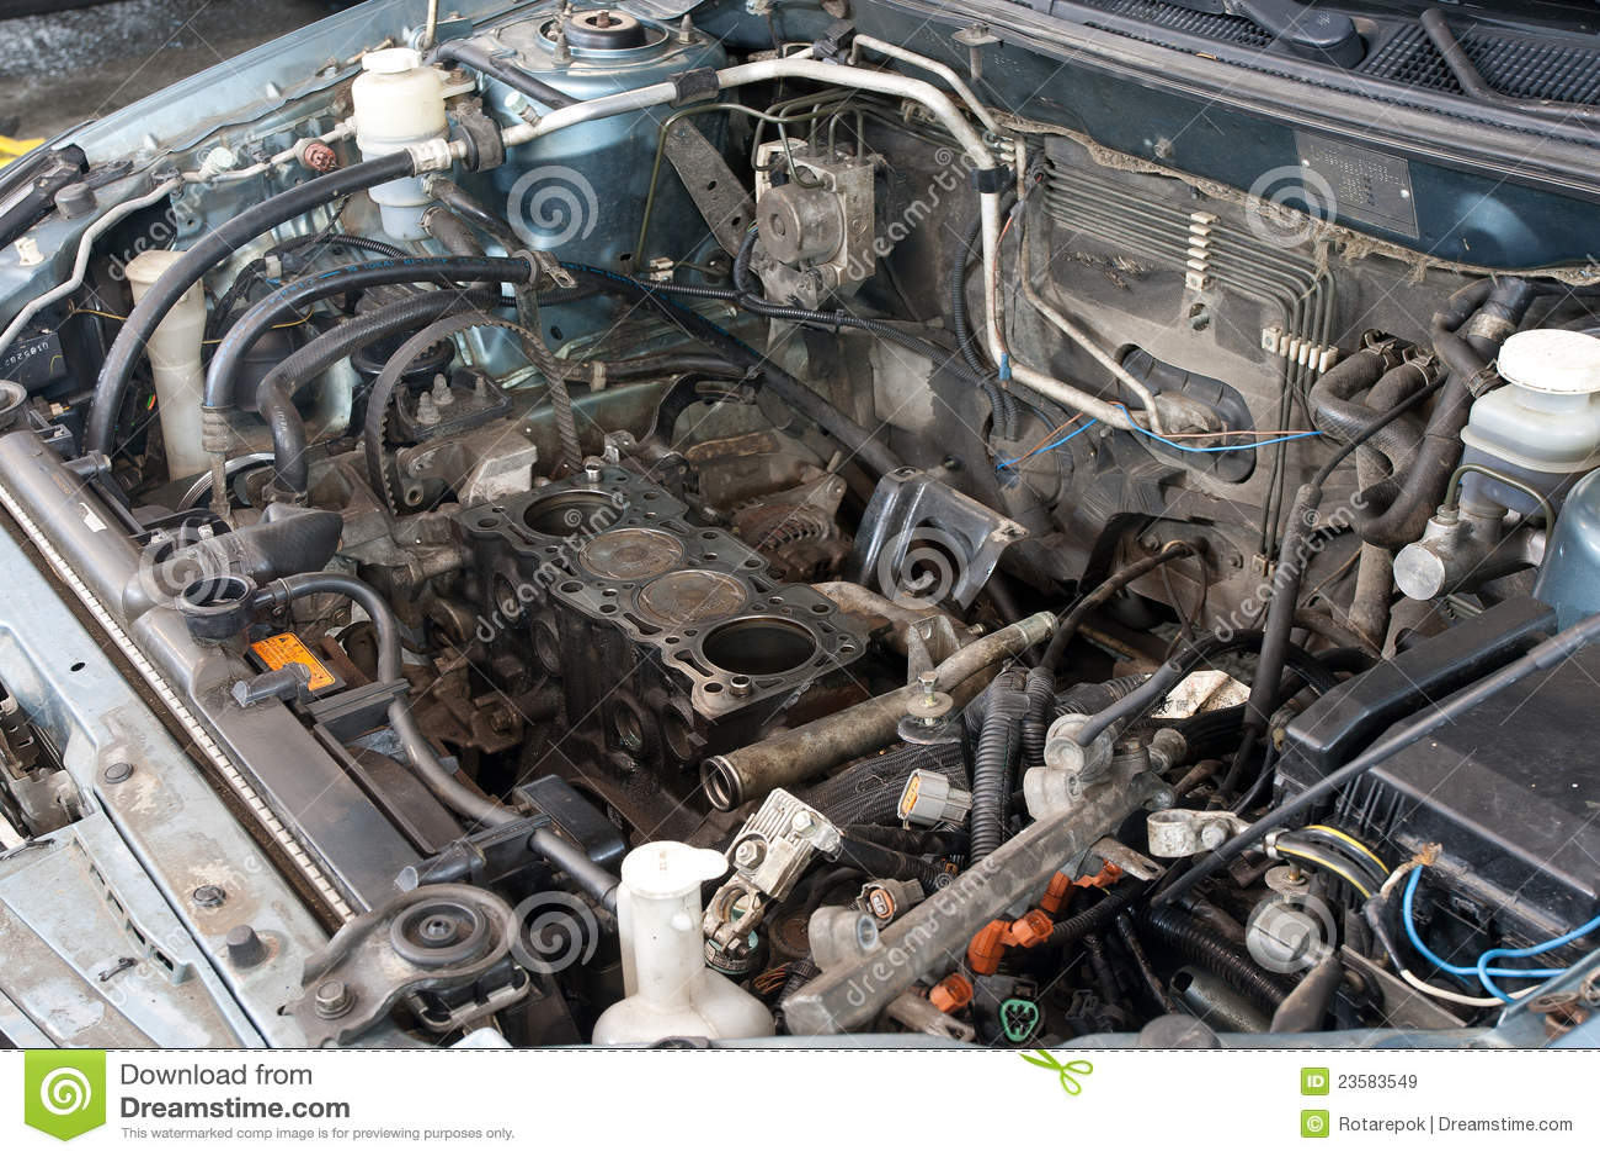 broken car engine stock image image of broken  gasoline 1978 Jeep a C Diagram Ford Truck Engine Diagram